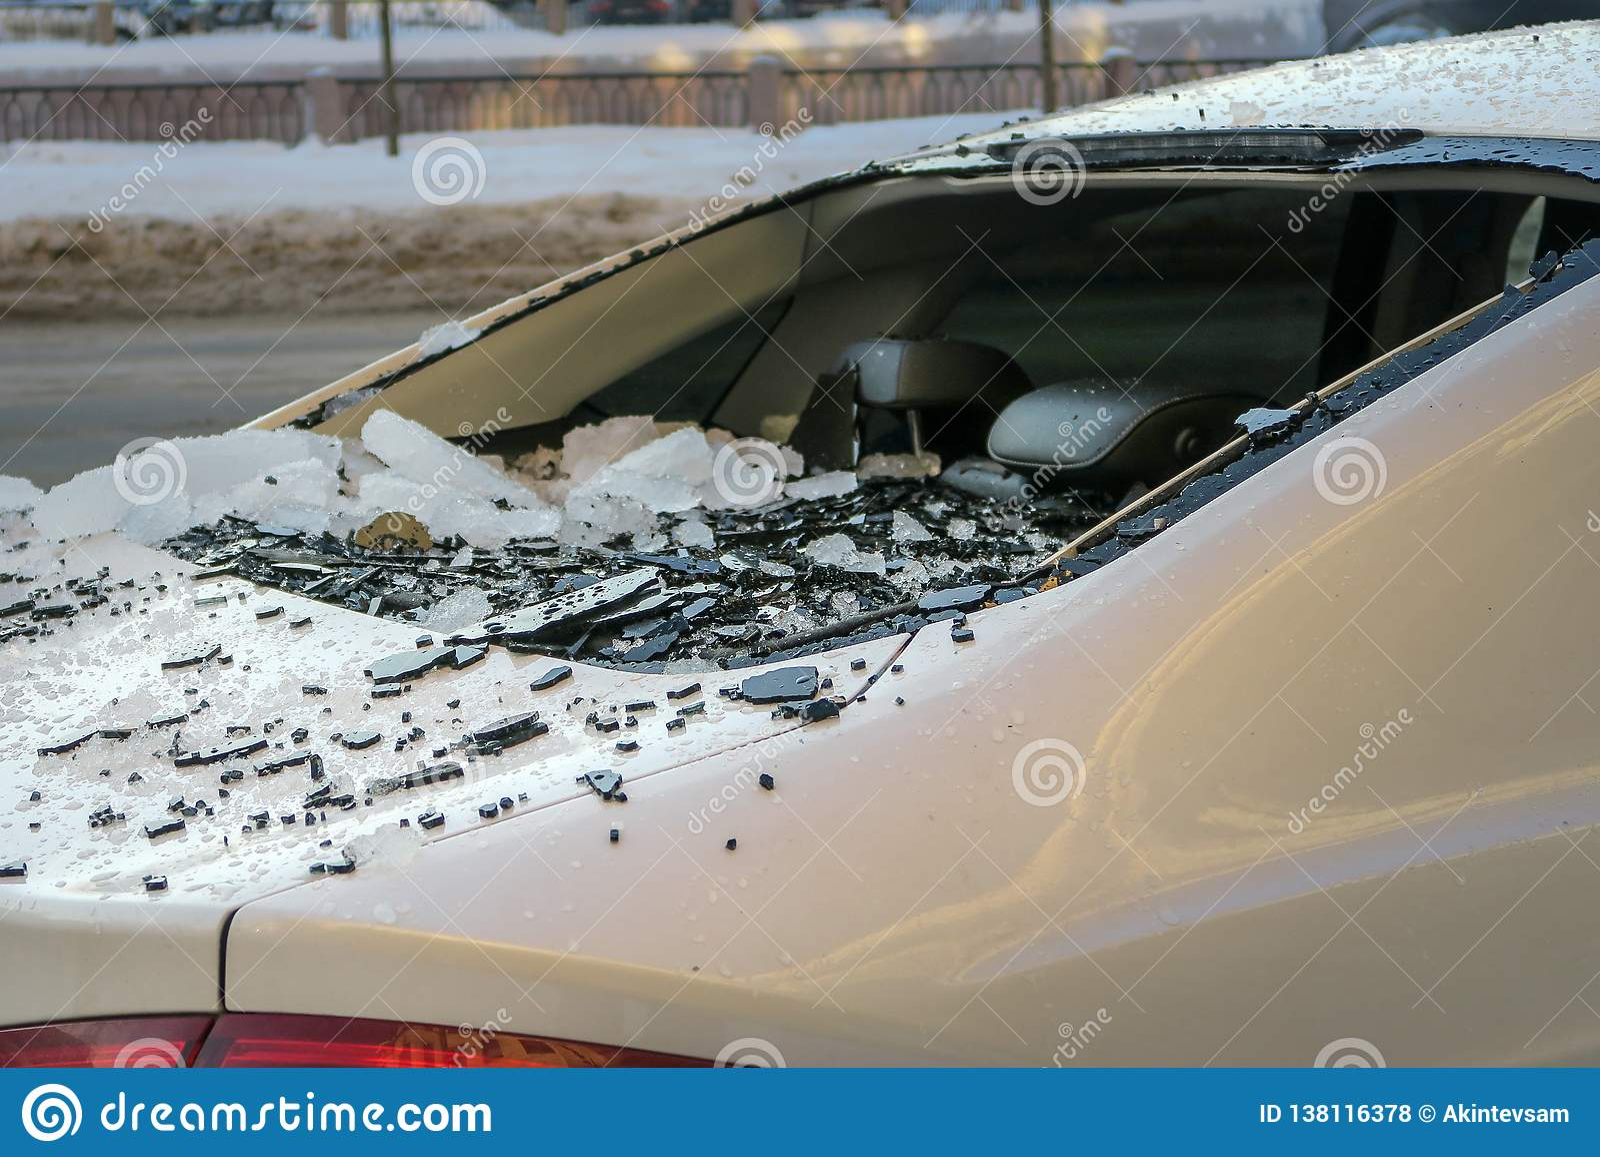 Indicador de carro quebrado carro danificado do gelo de queda